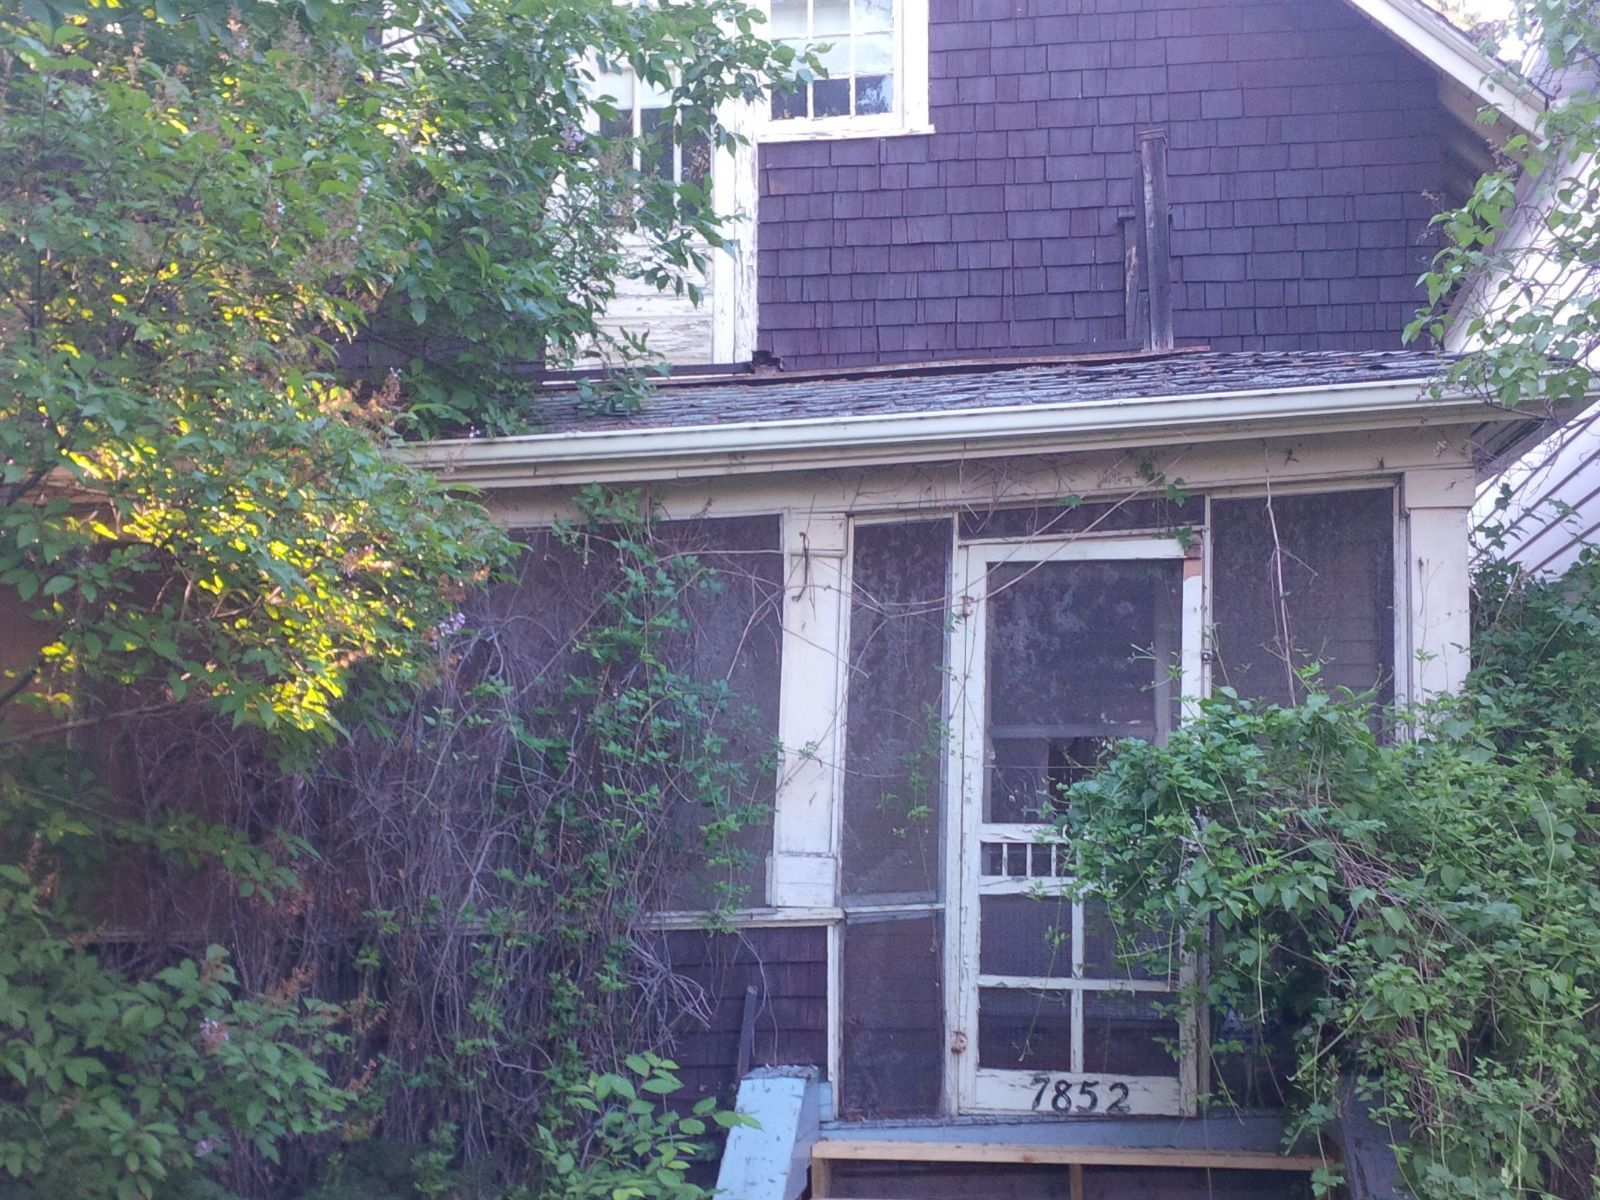 7852 jasper avenue nw edmonton northwest for sale comfree